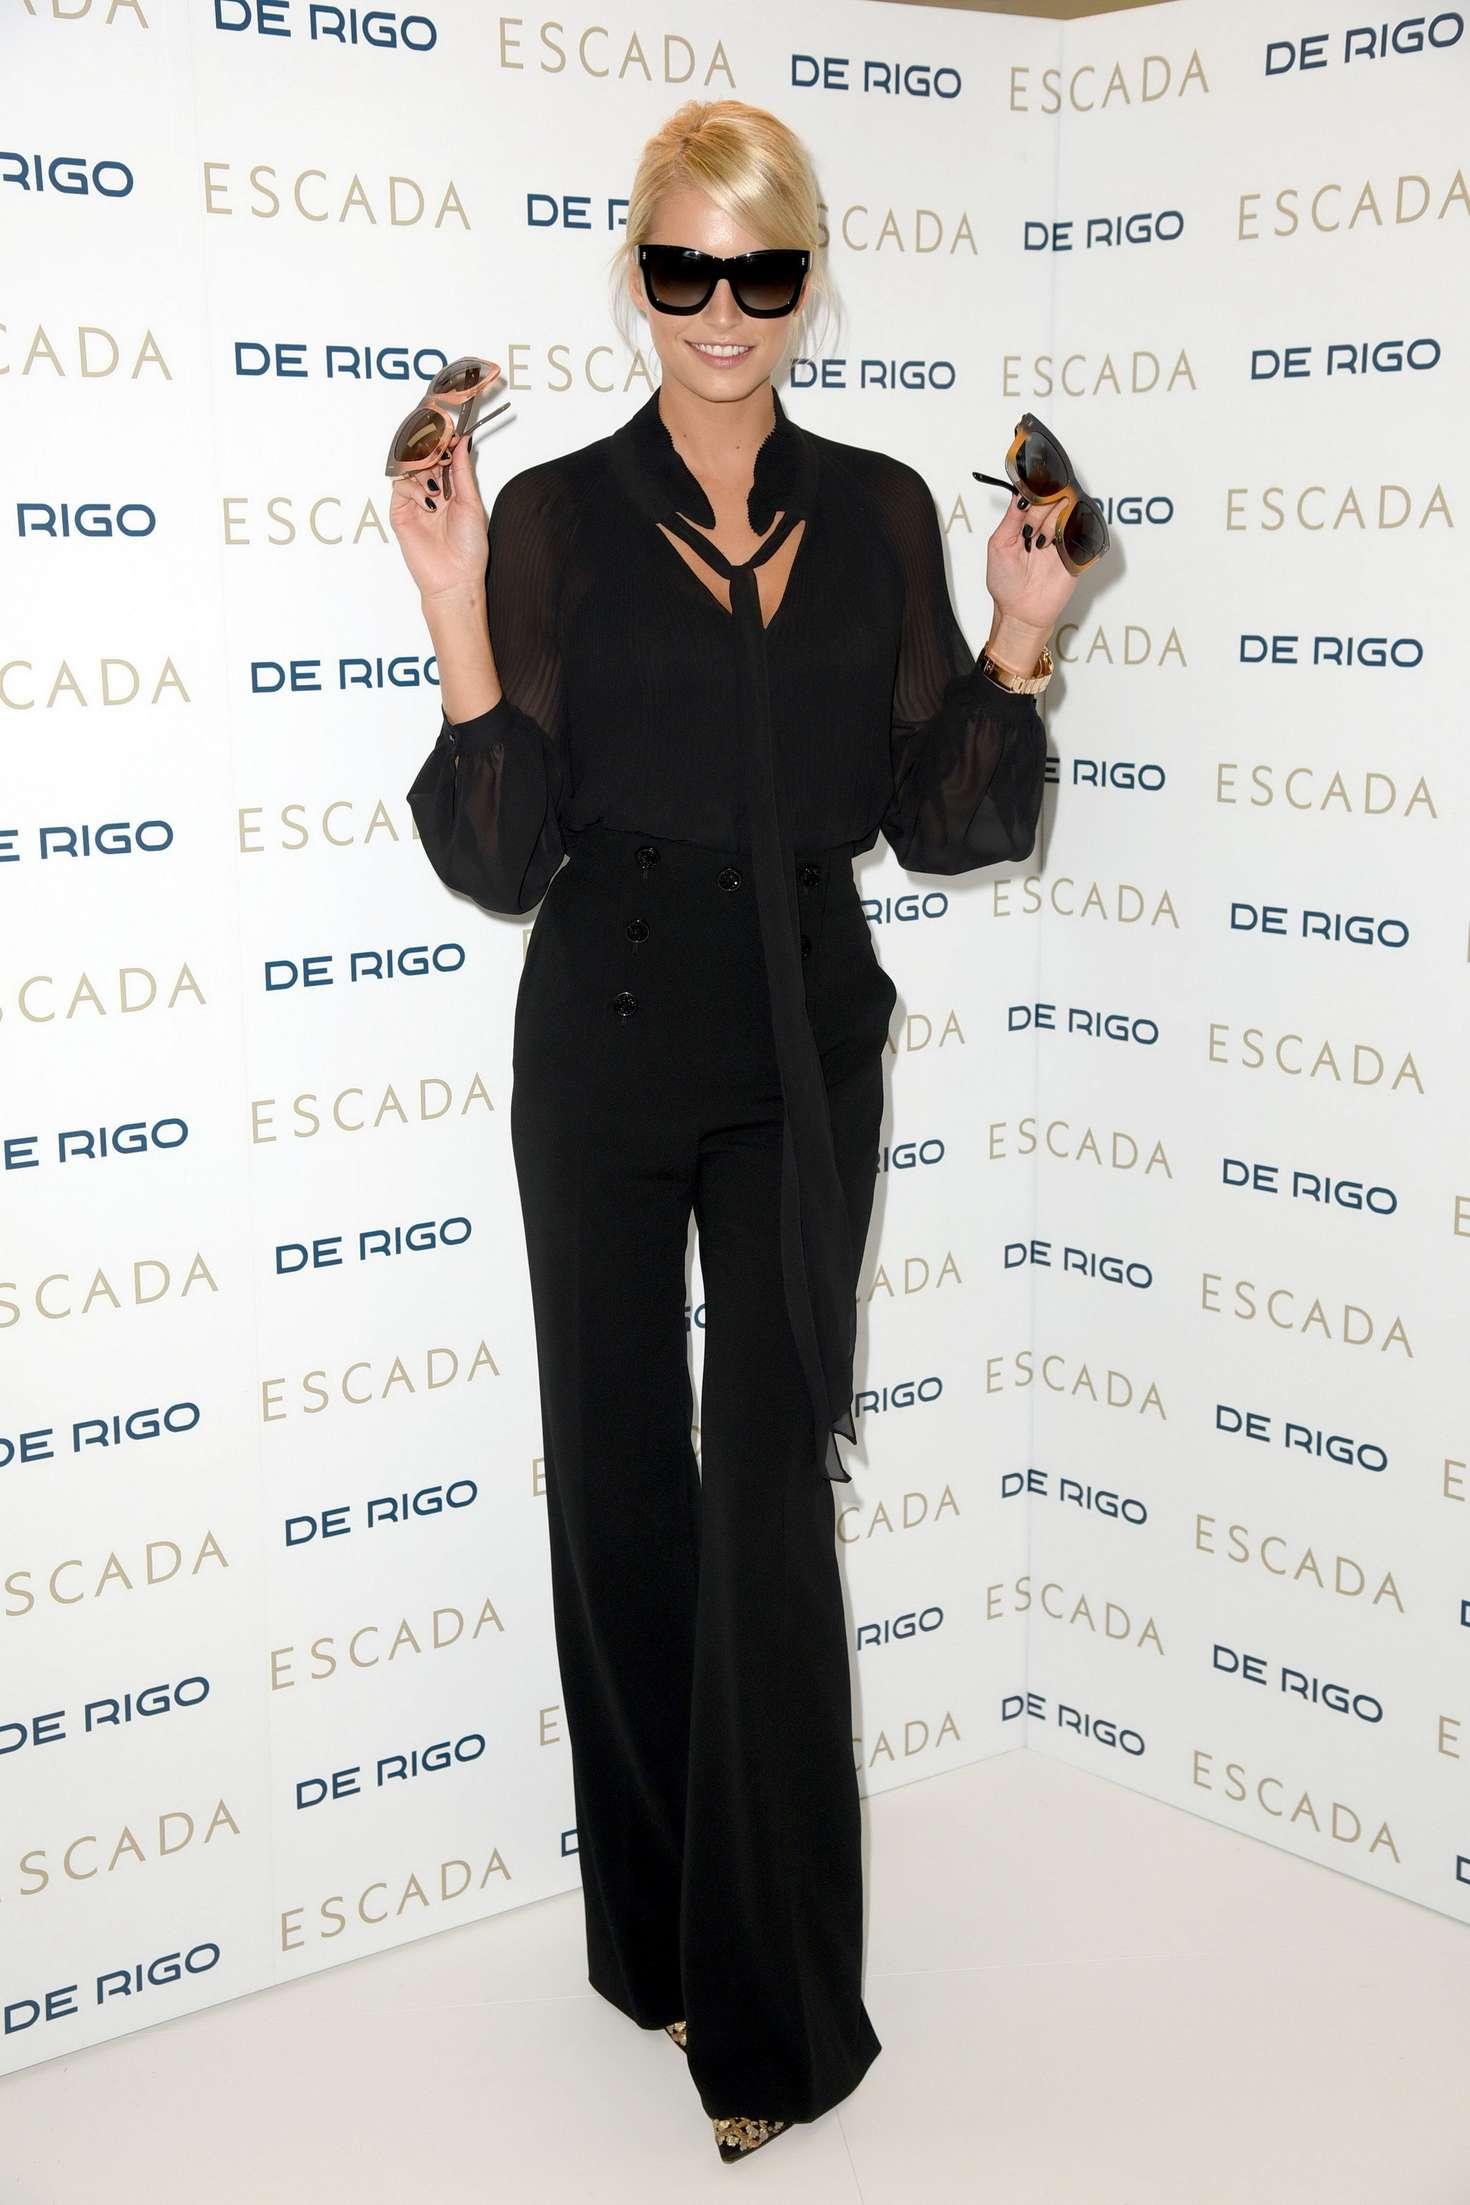 Lena Gercke Posing for Sunglasses from Escada in Munich